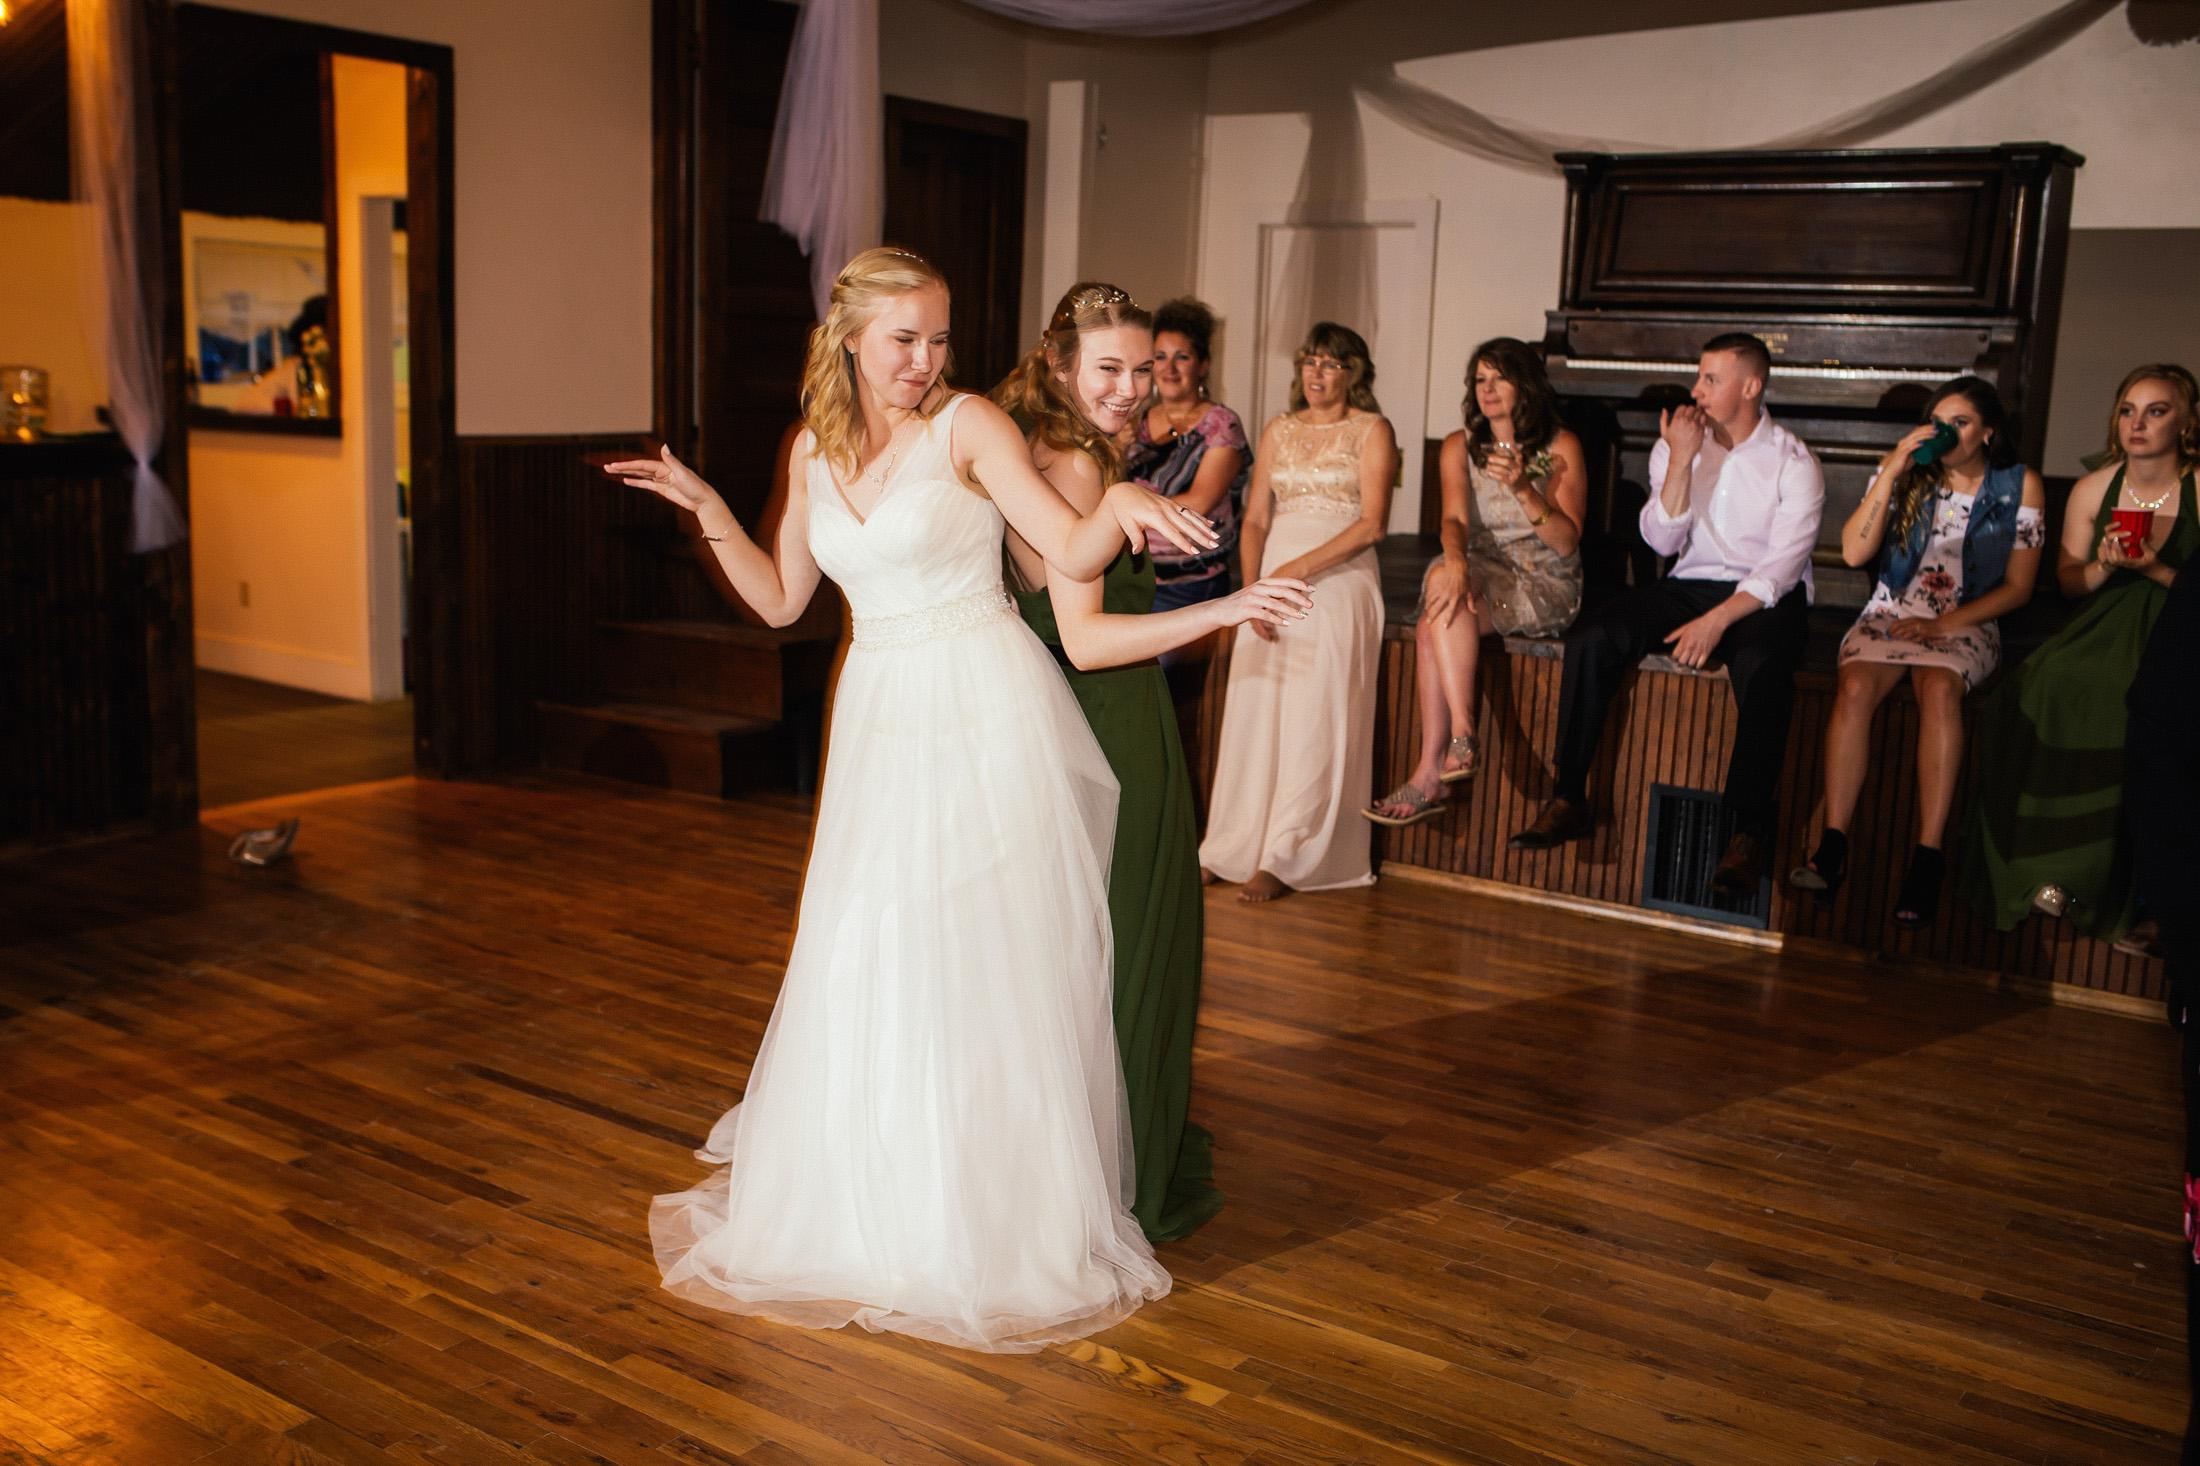 Bride dances with friends inside banquet hall.